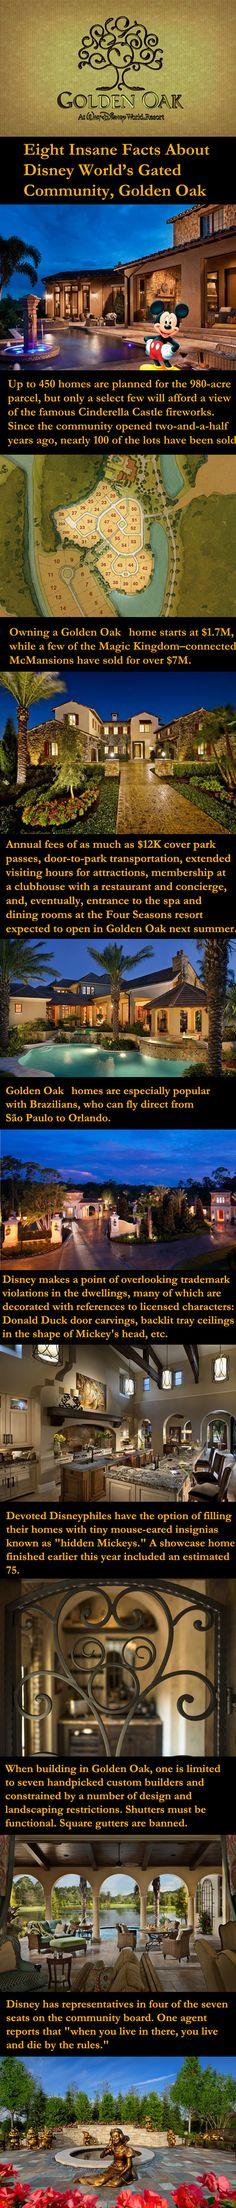 GOLDEN OAK.  Eight Insane Facts About Disney World's Gated Community